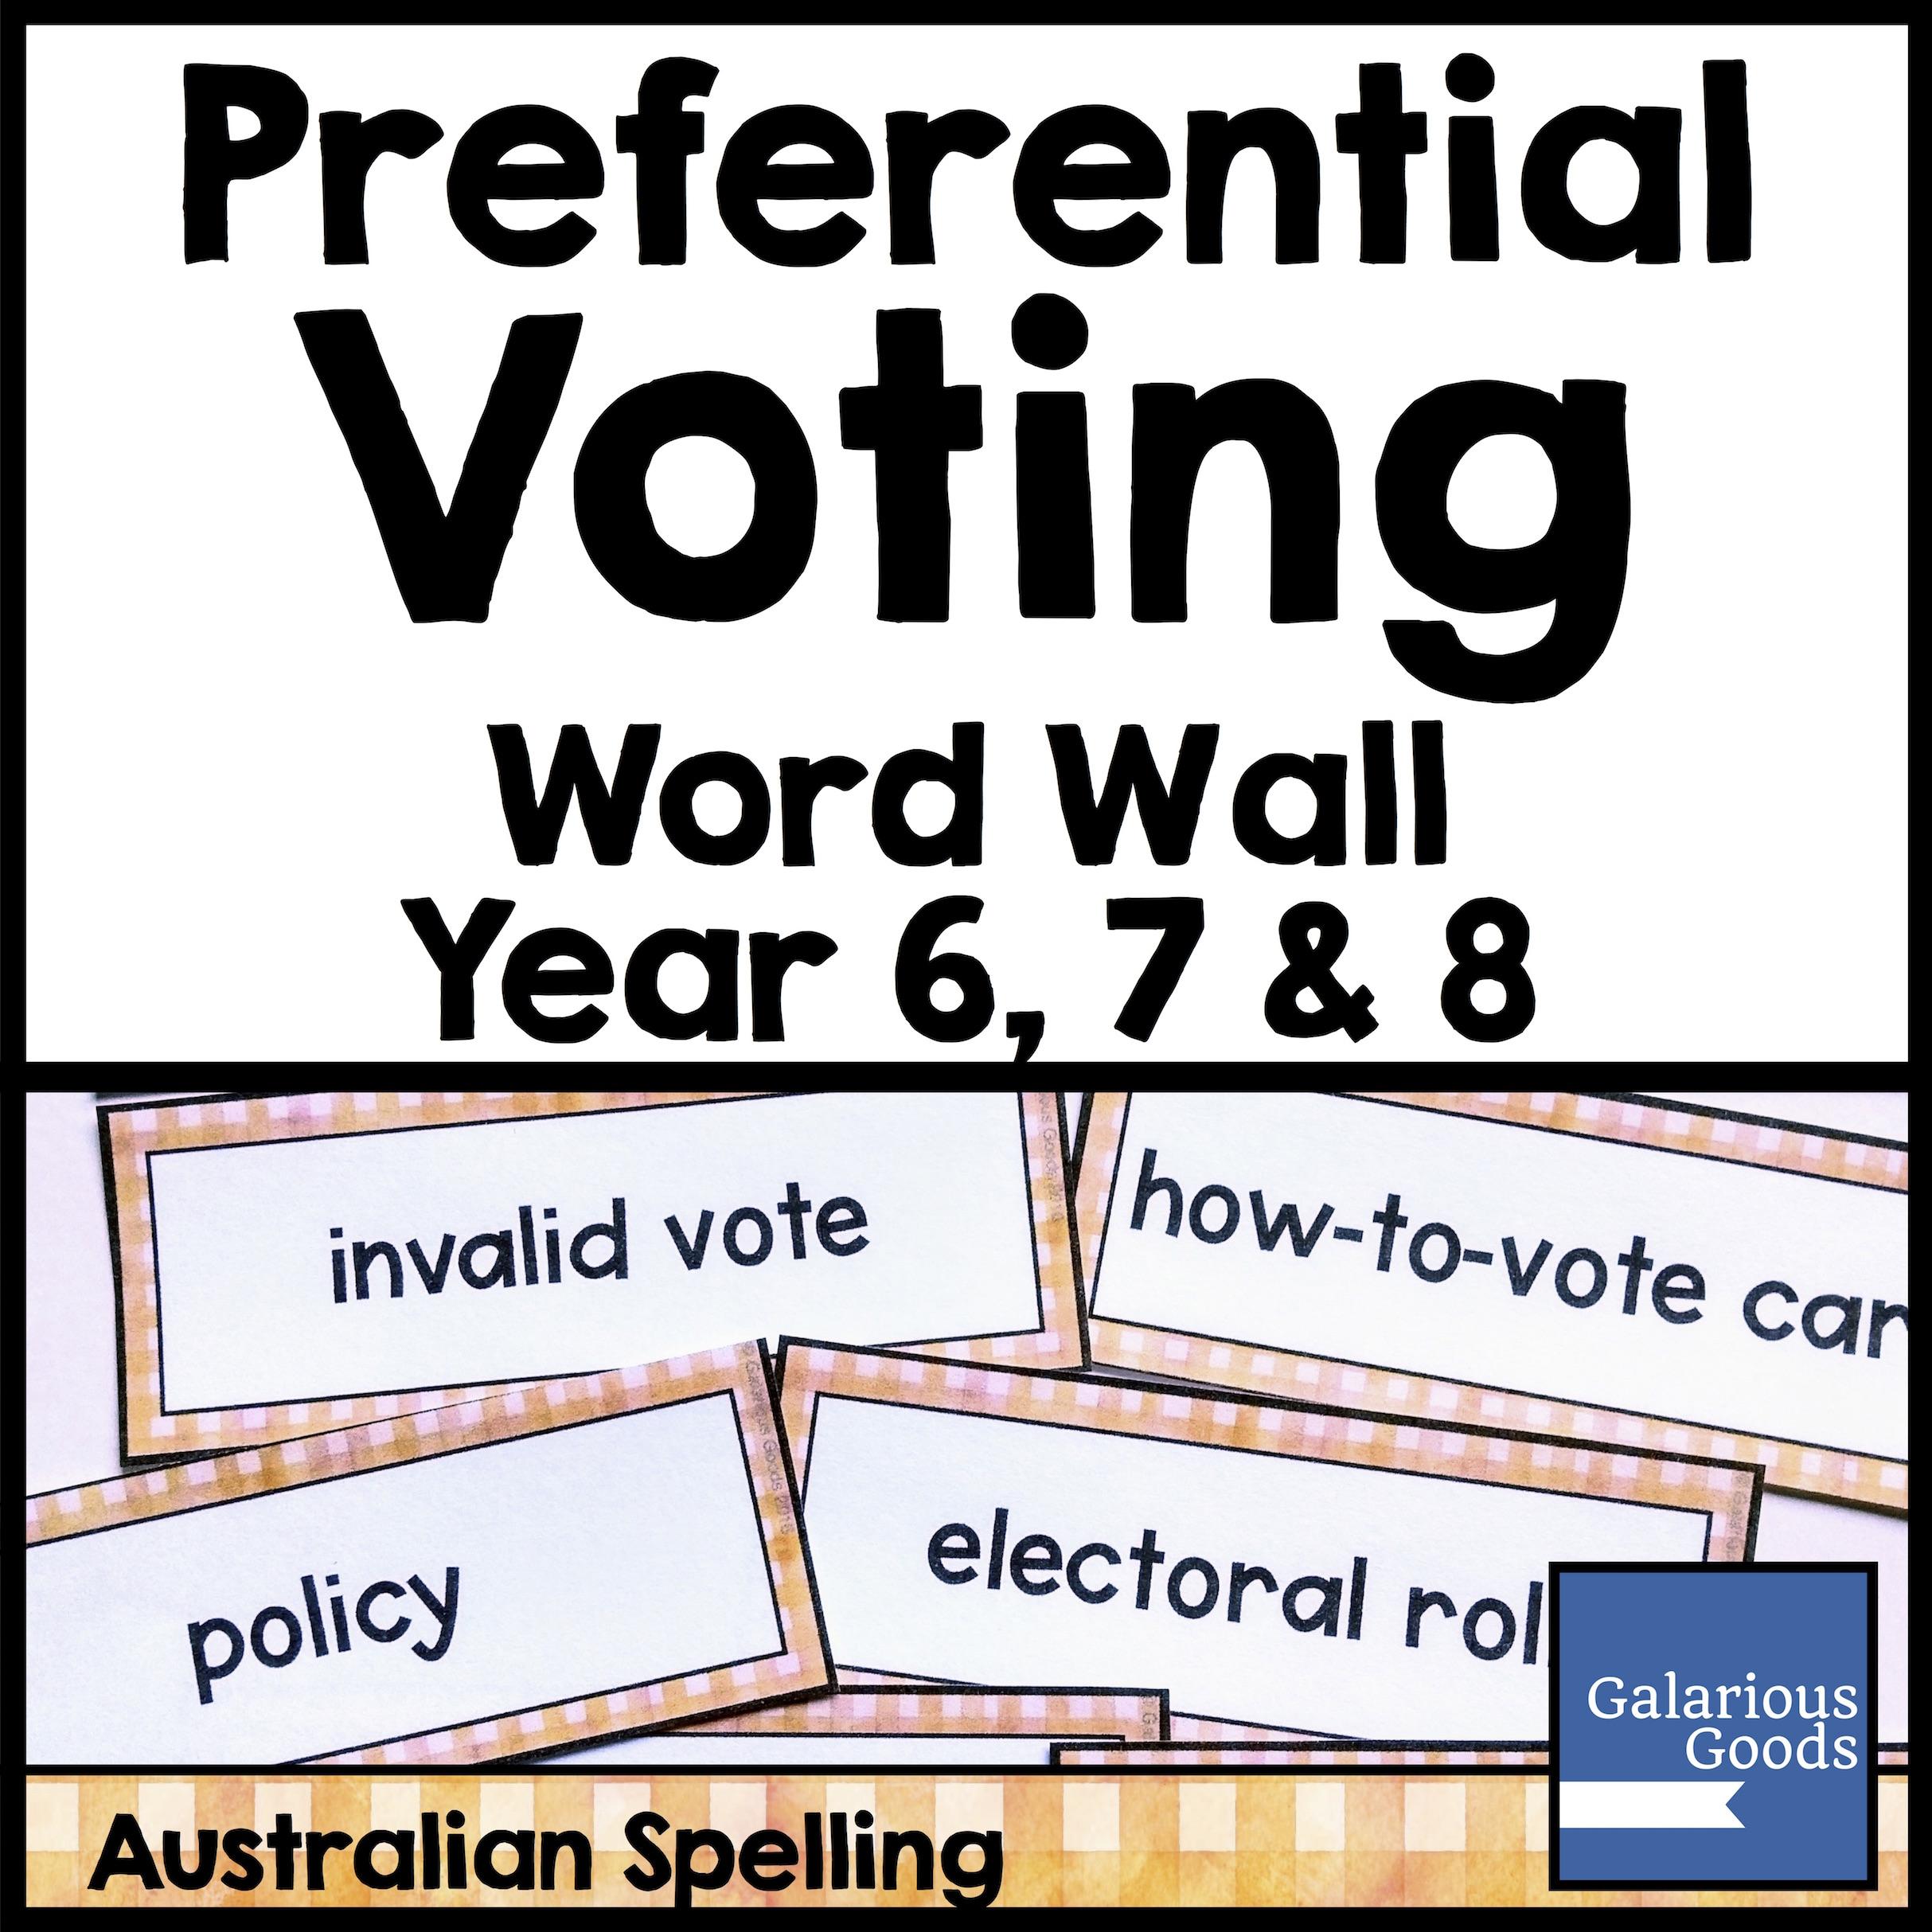 cover pref voting ww.jpg